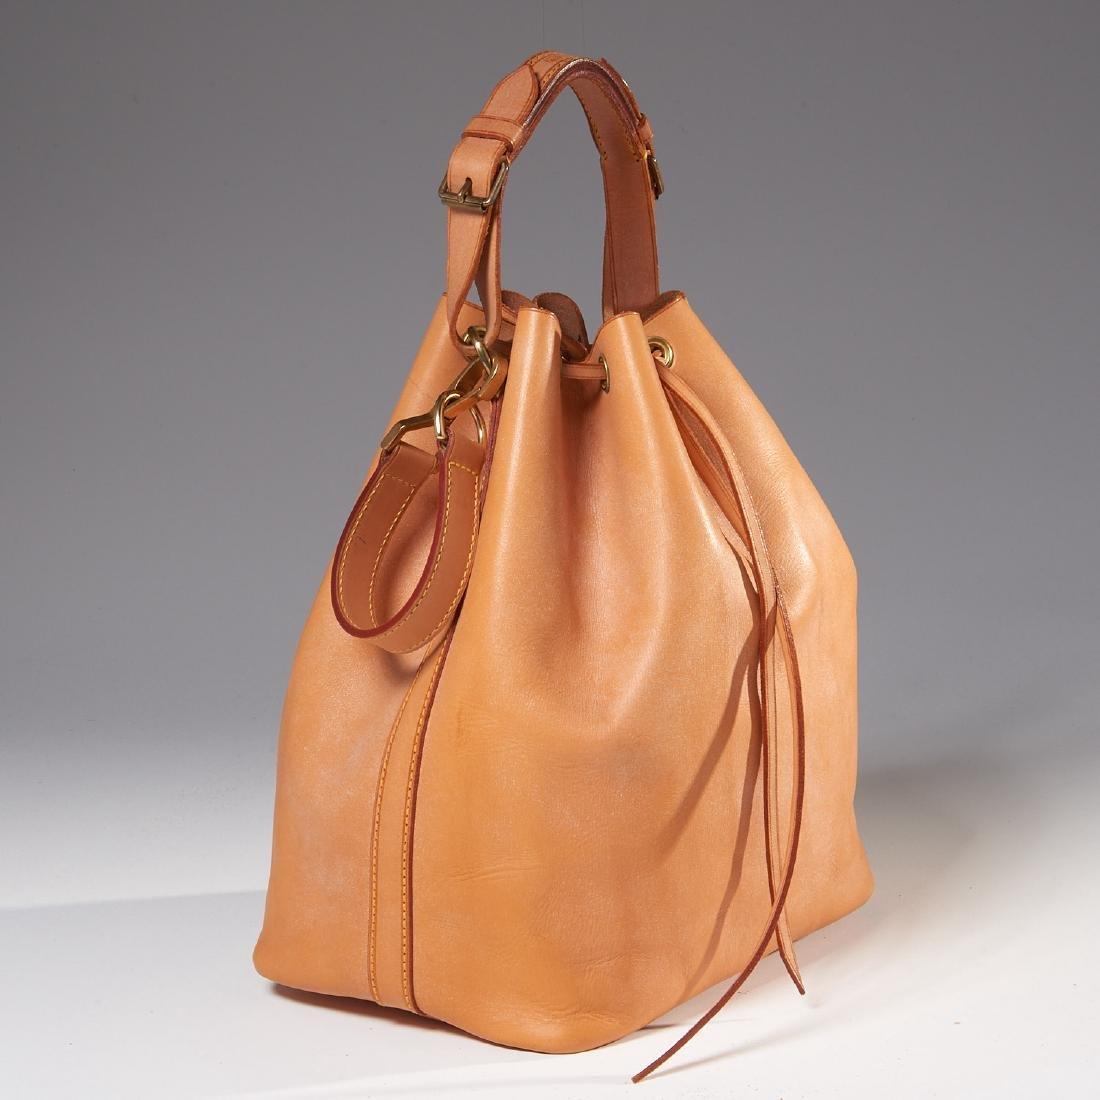 Louis Vuitton all leather drawstring handbag - 2